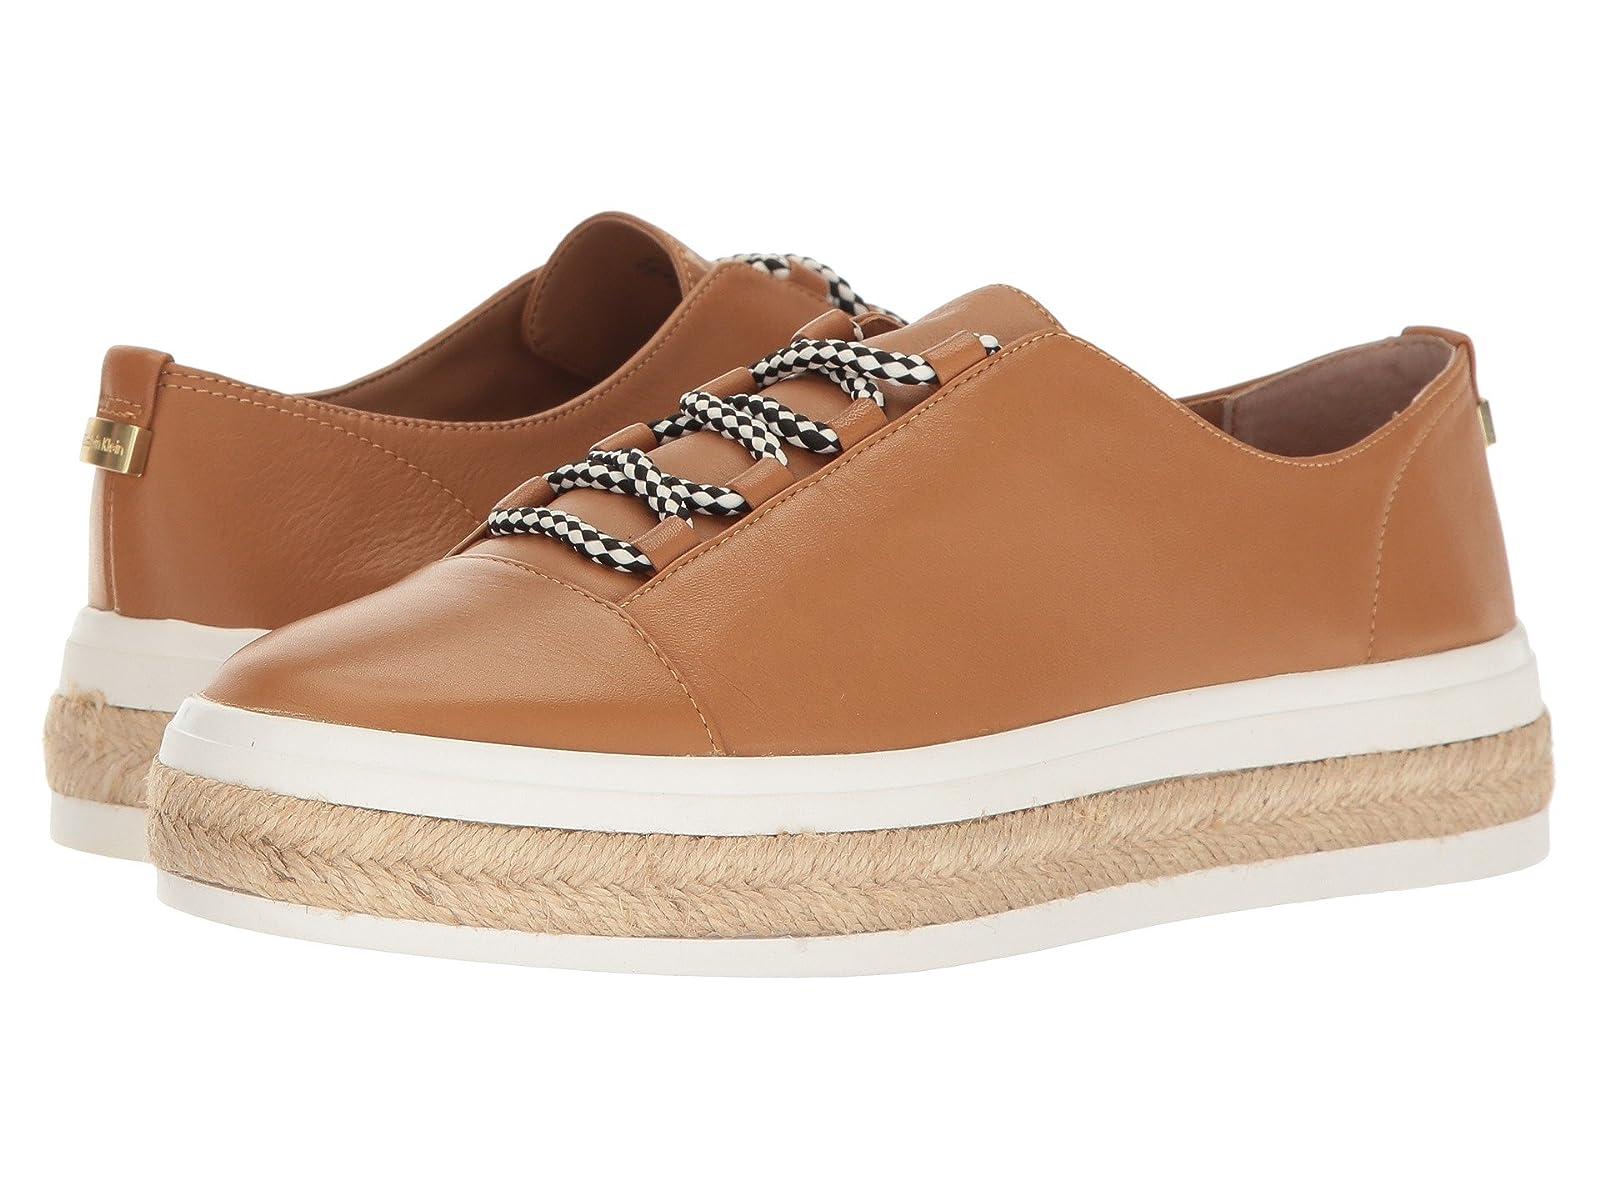 Calvin Klein JupaCheap and distinctive eye-catching shoes